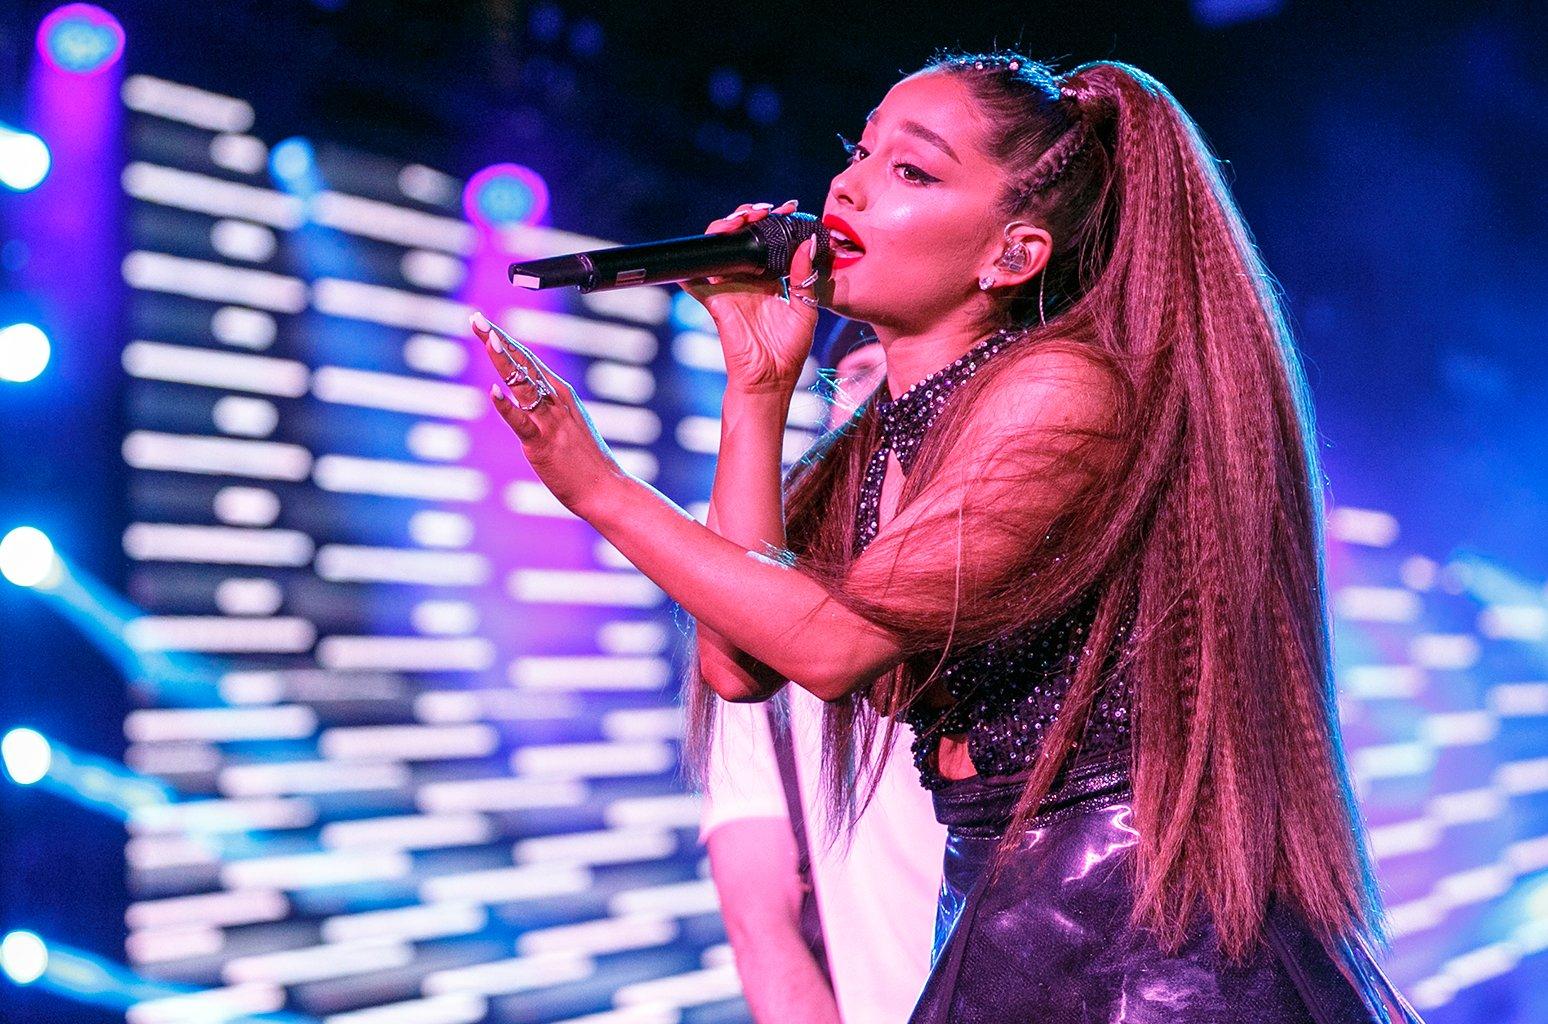 Check out the best fan reactions to Ariana Grande's 'God Is A Woman' https://t.co/m0kLlLykaR https://t.co/cT8wEtu9ok